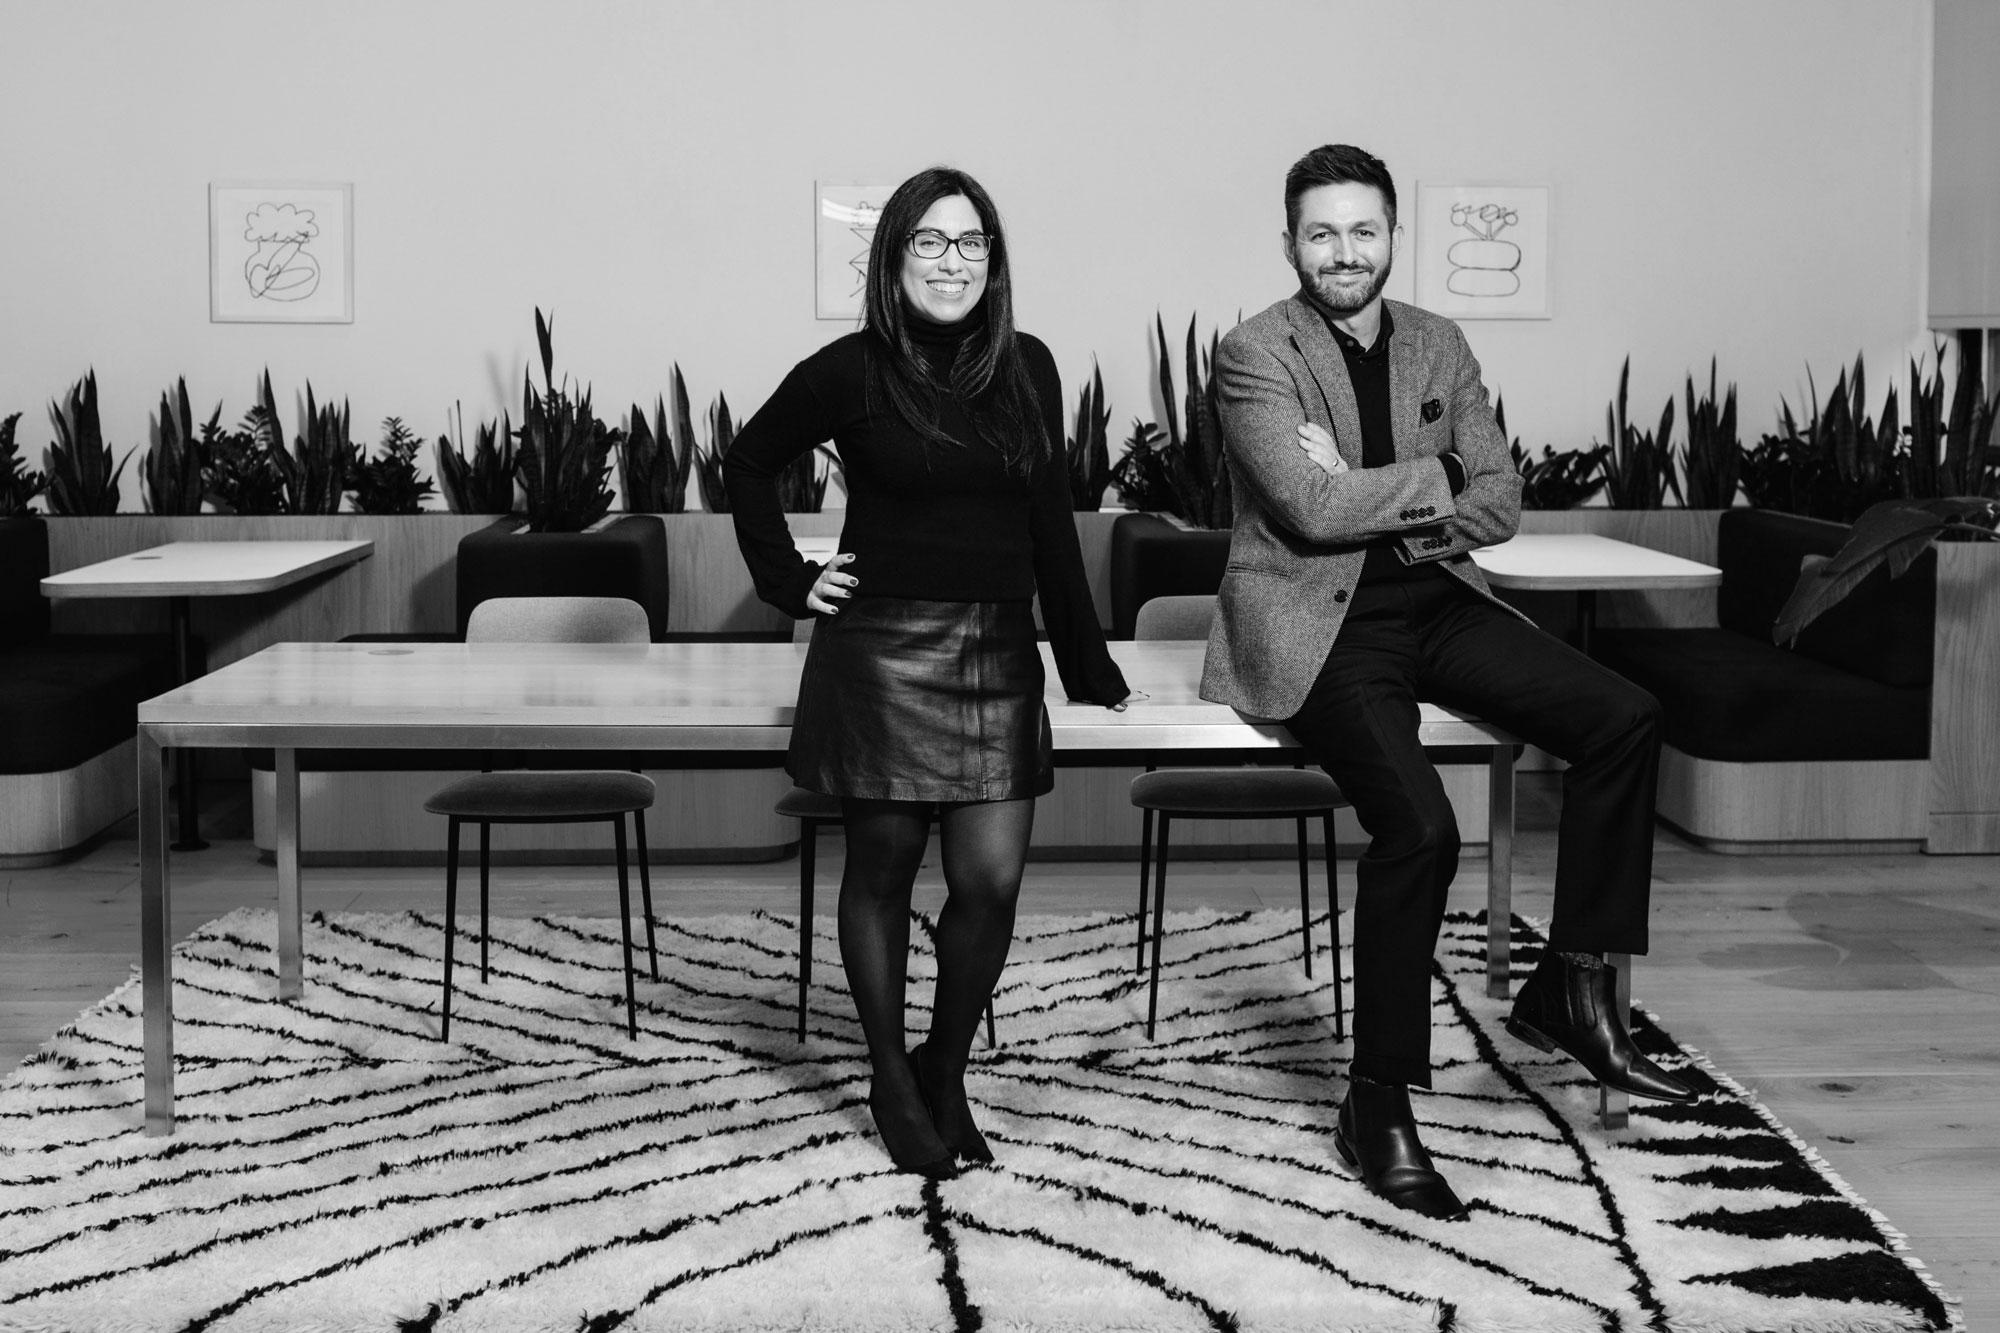 Vanessa-Mendoza-Troy-Senik-Founders-Kite-Key-Media